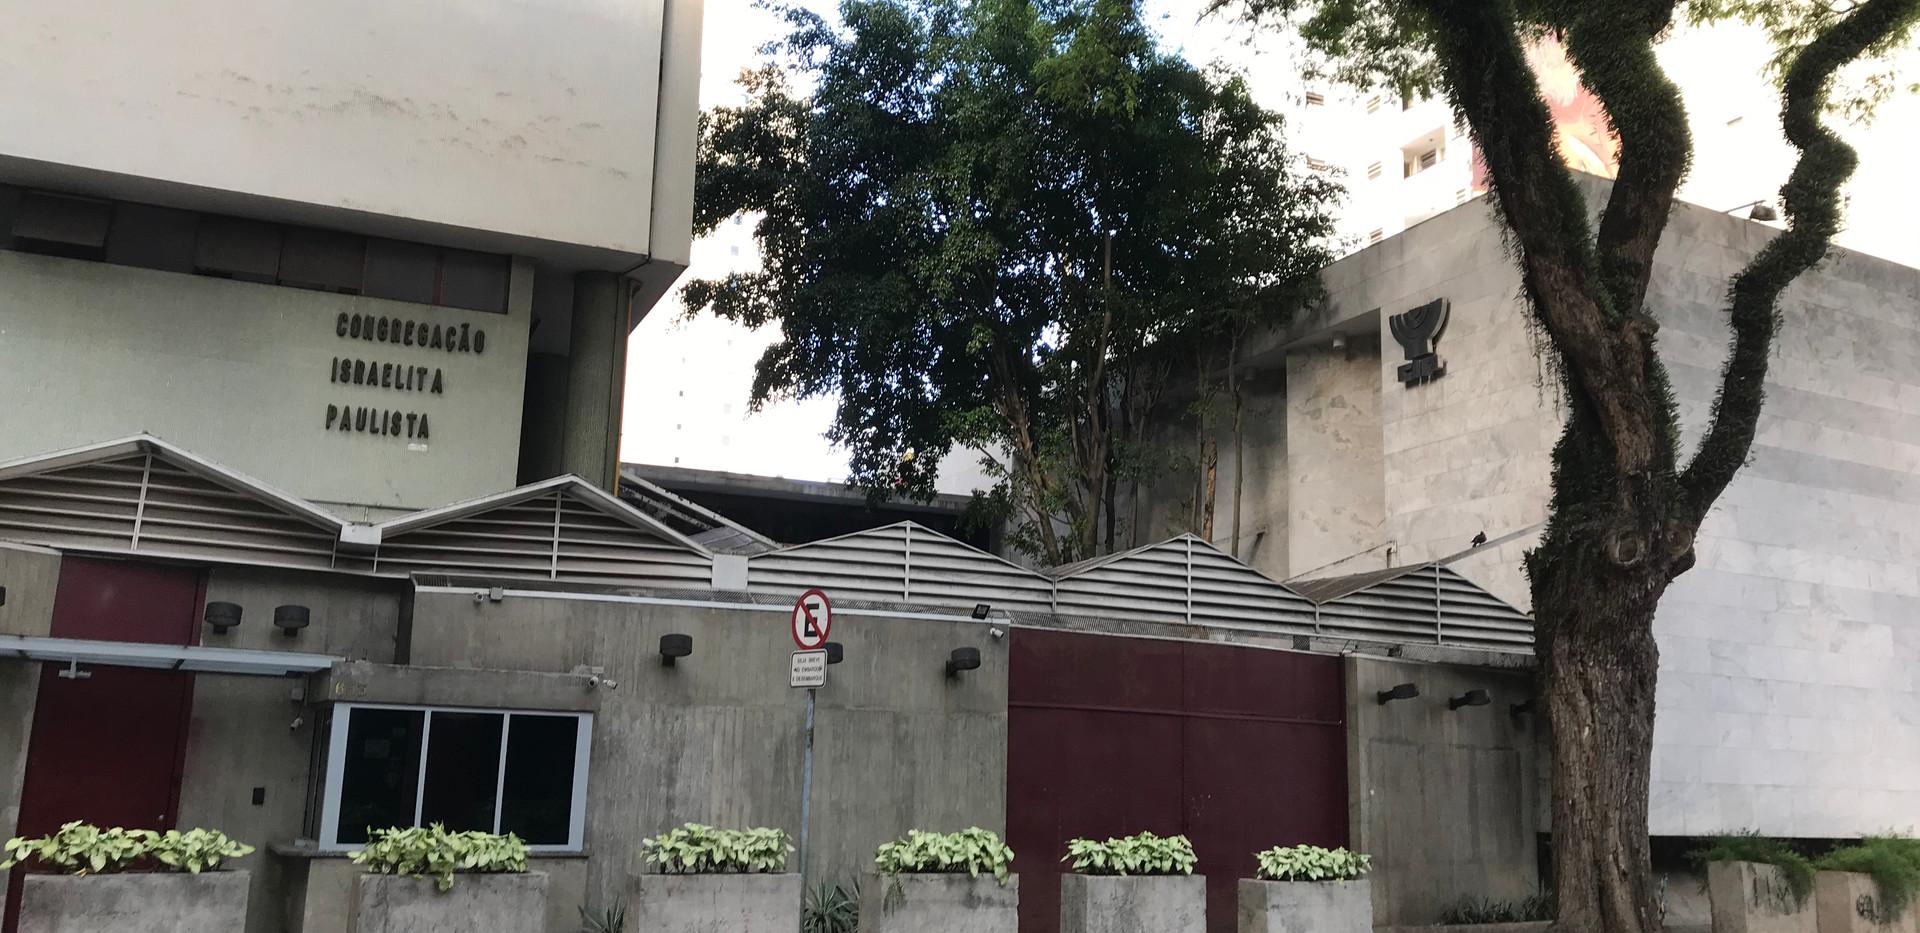 BarMitzvah Híbrido | Brasil x Estados Unidos